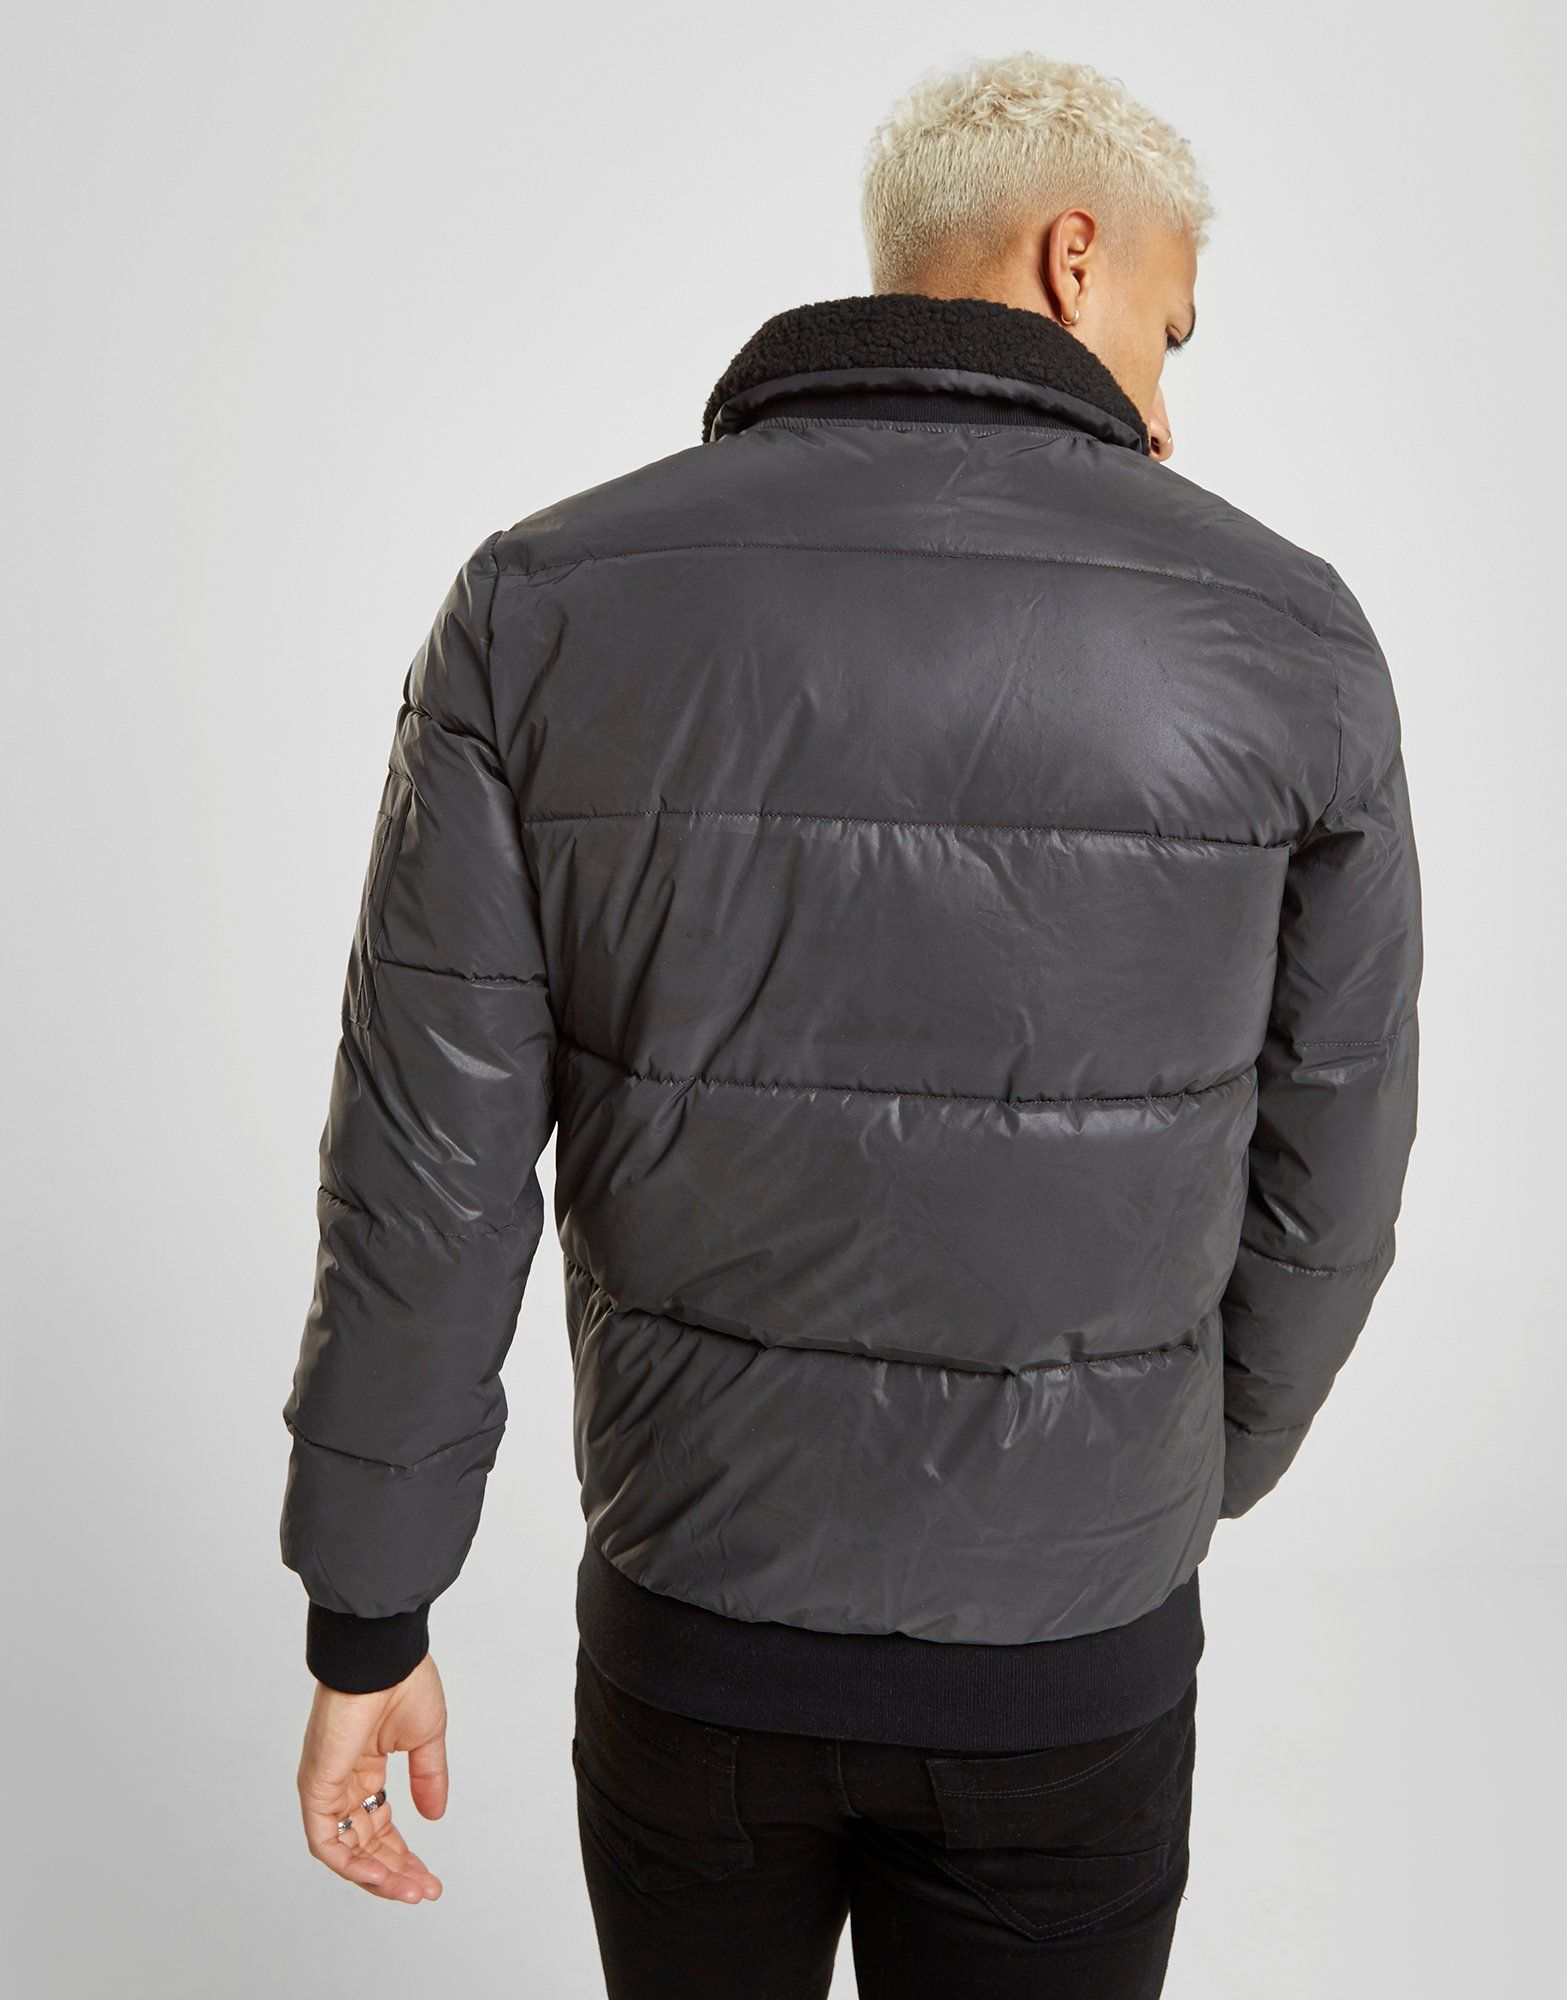 Supply & Demand Helix Flight Jacket